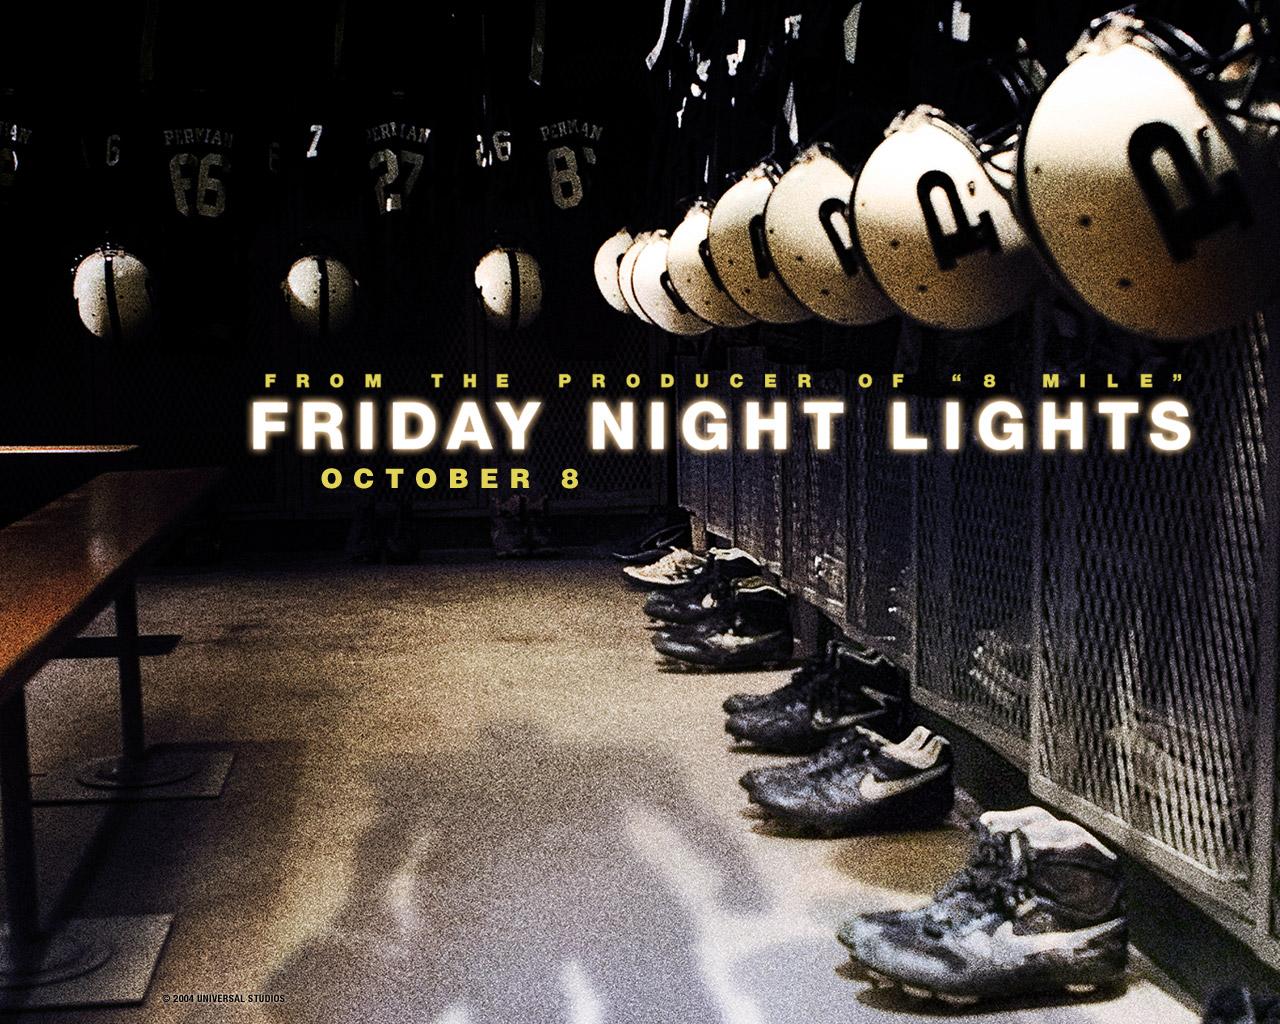 Friday Night Lights Wallpaper   10005879 1280x1024 1280x1024